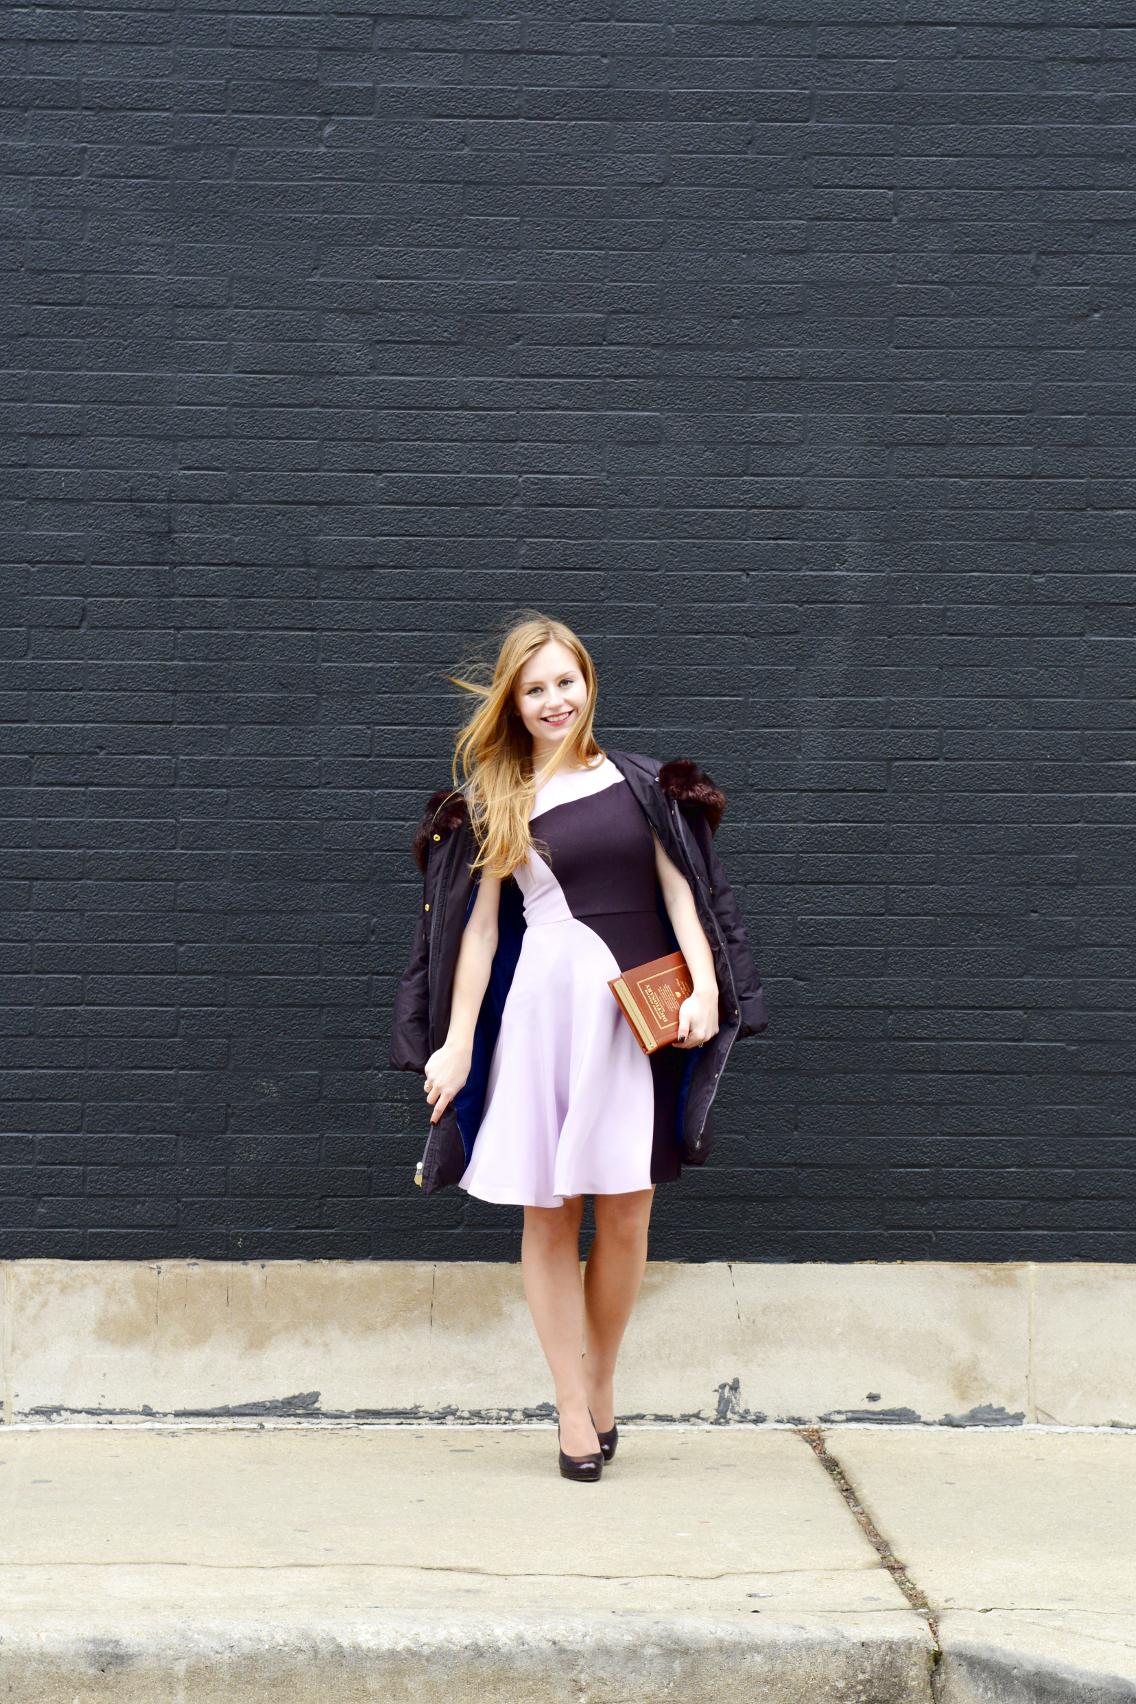 3.1 Phillip Lim Colorblock Dress Kate Spade Dictionary Clutch 4